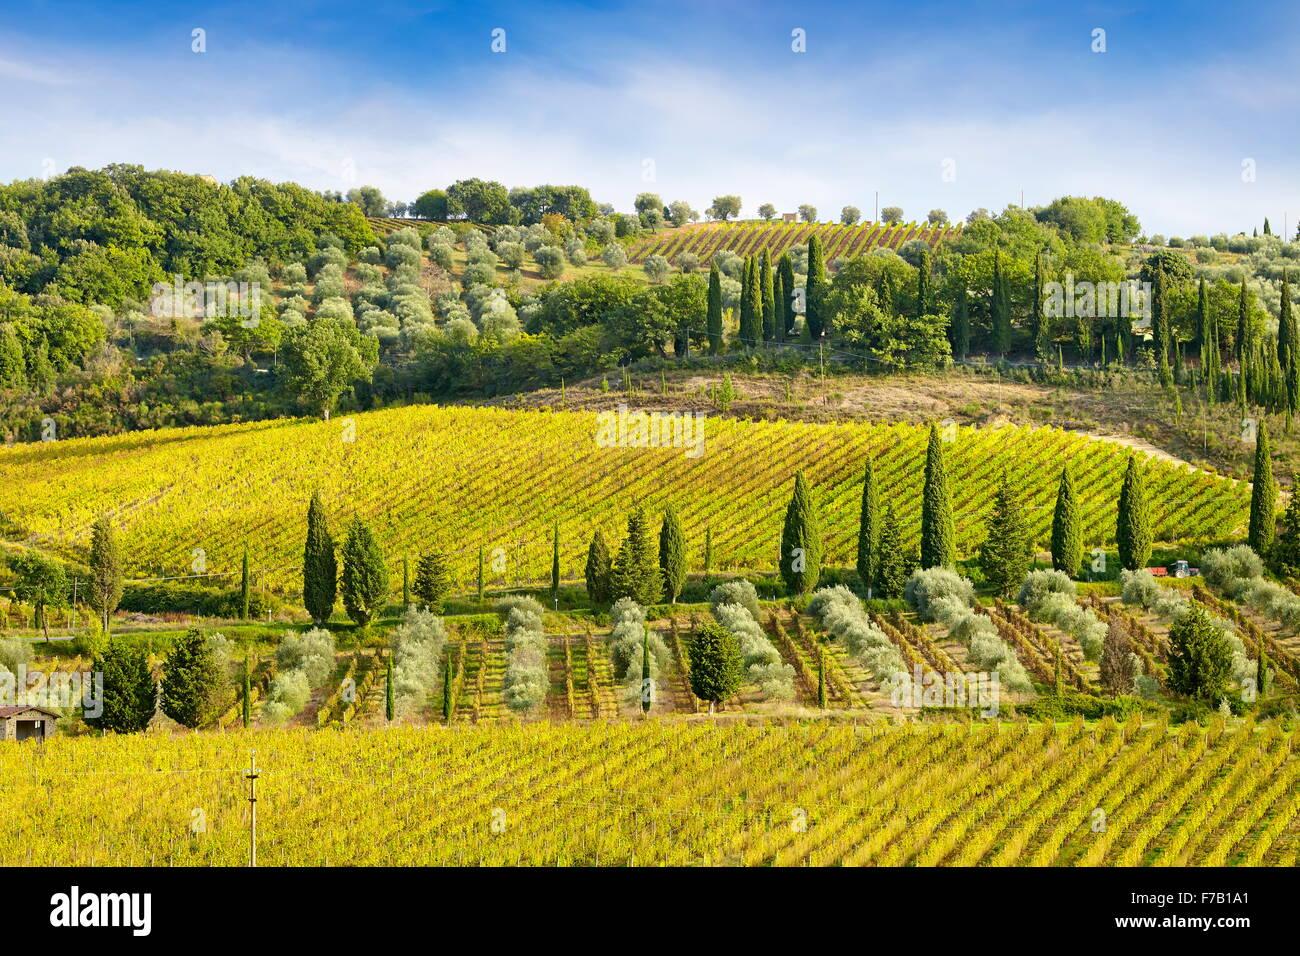 Vigne, Toscane Italie Photo Stock